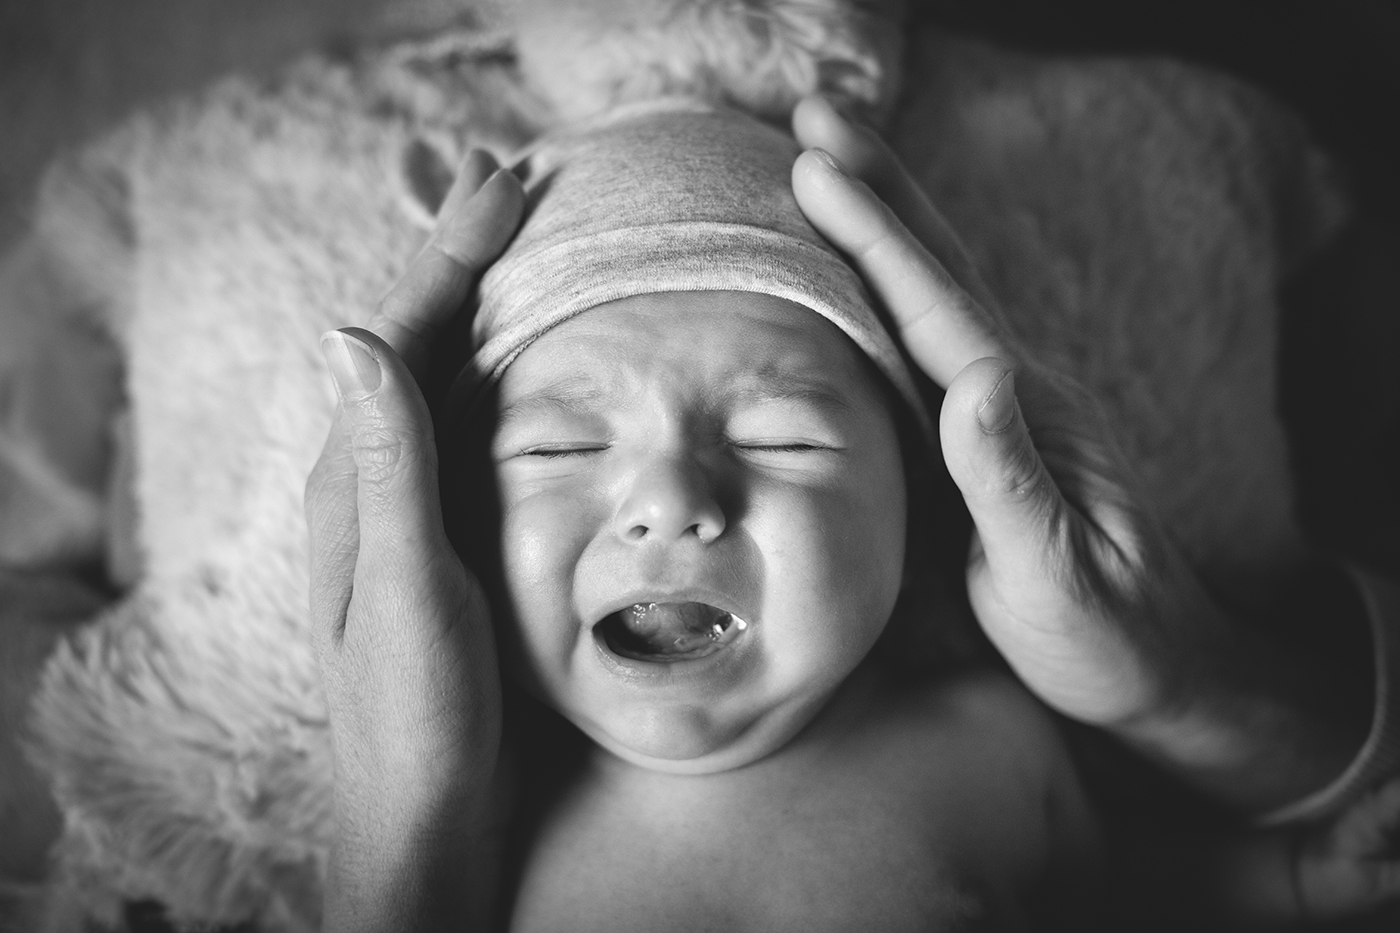 photographe-naissance-maternite-enfant-bebe-poitiers-guillaume-heraud-24